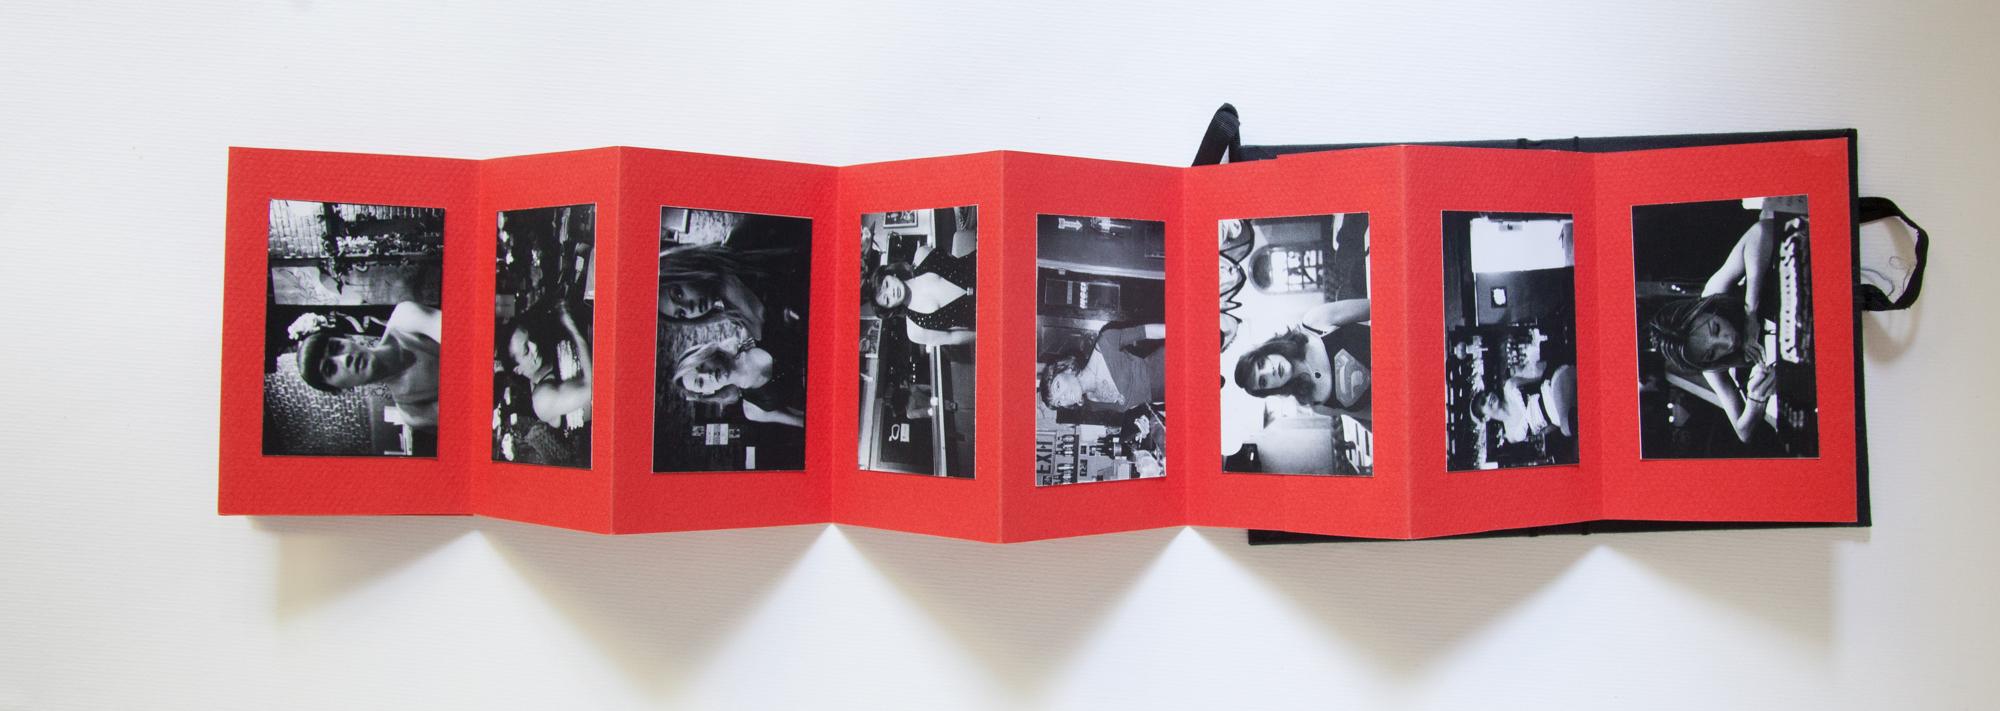 235_POcketbook of Drag Queens (2005)_.jpg